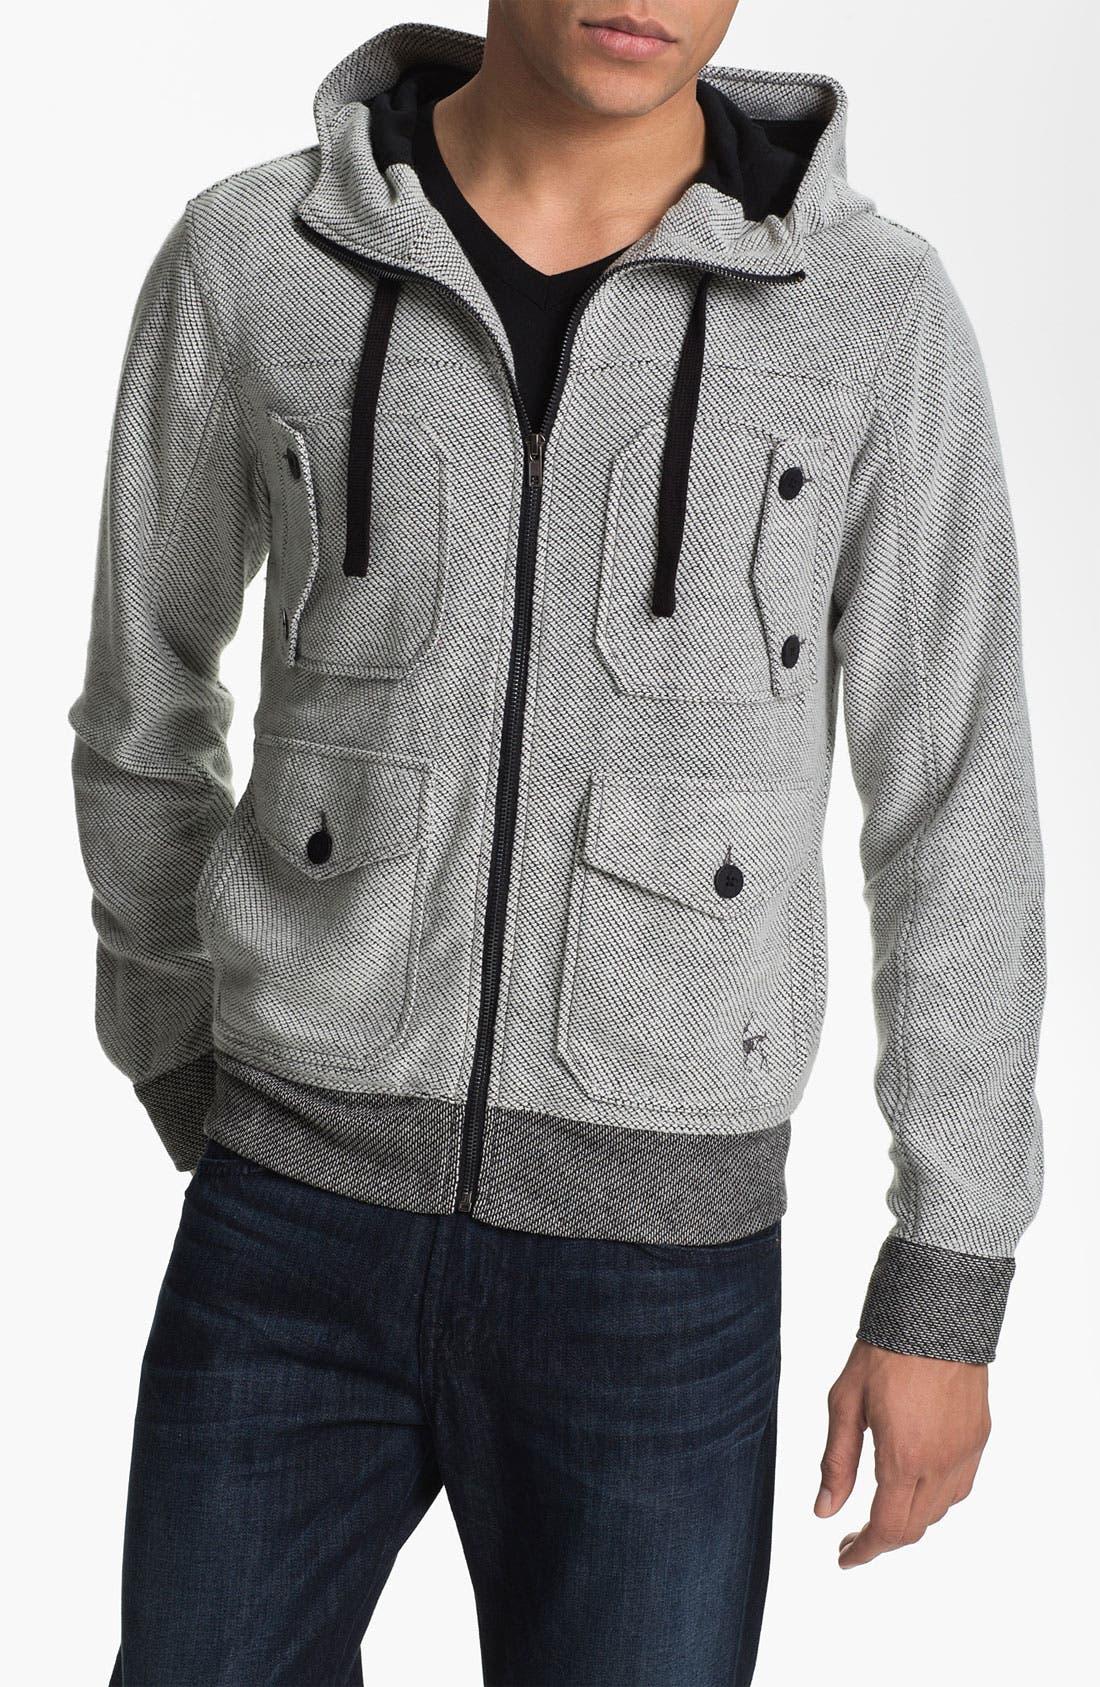 Alternate Image 1 Selected - Kane & Unke Hooded Knit Jacket